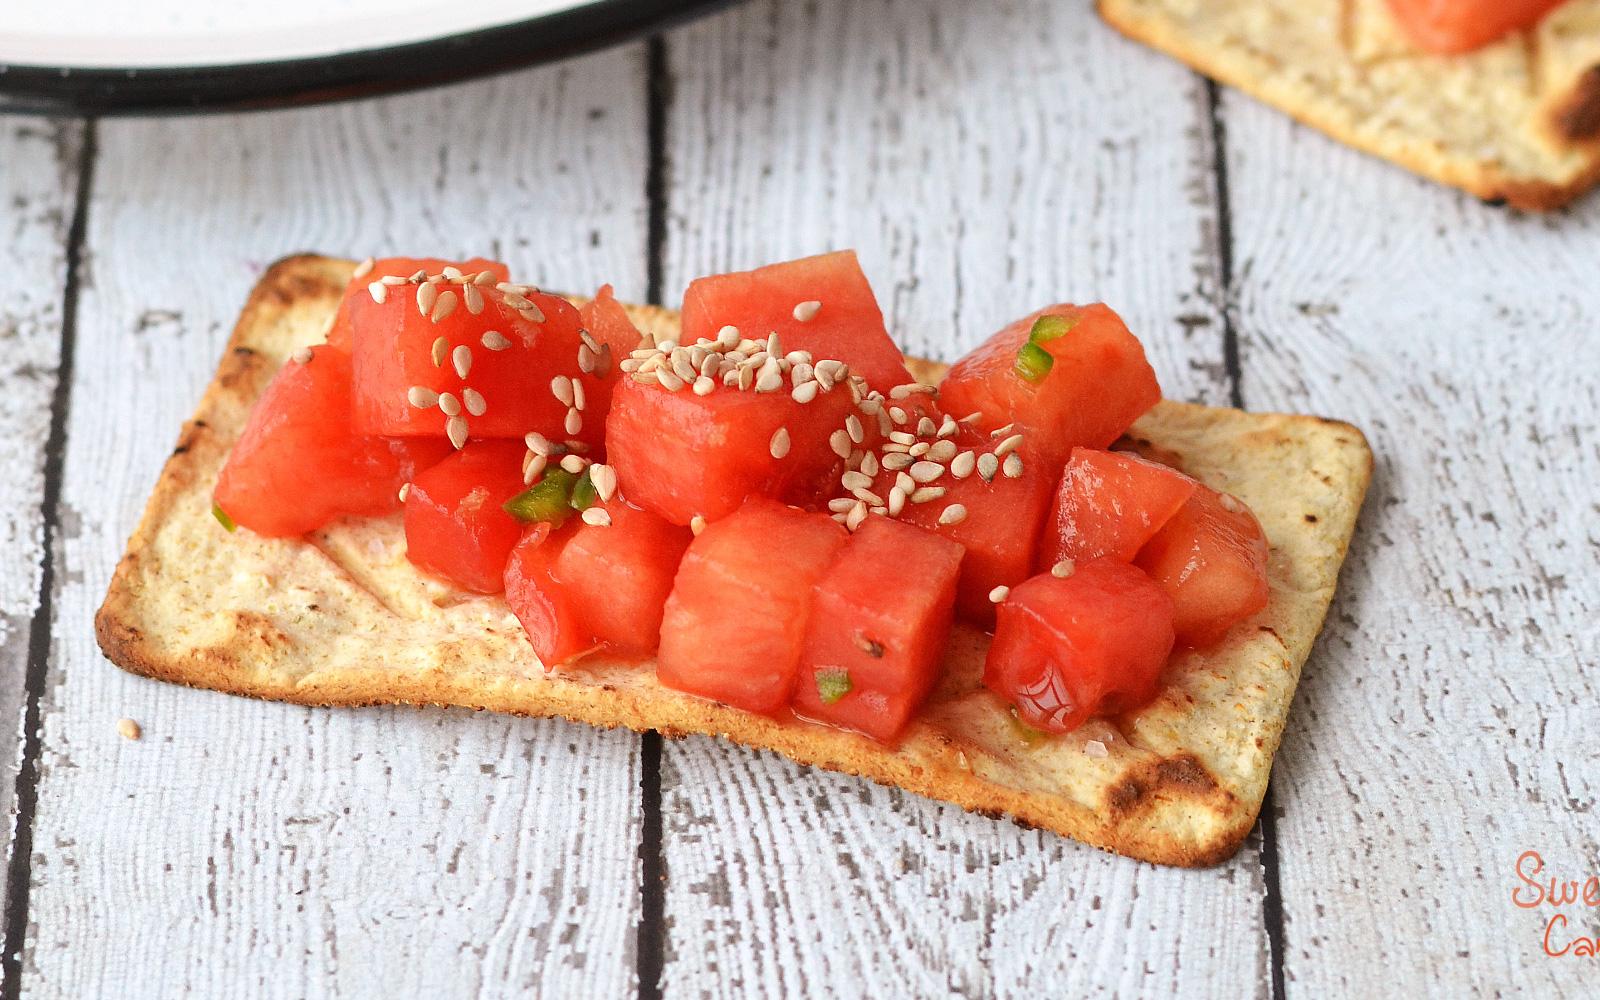 Watermelon Tartare